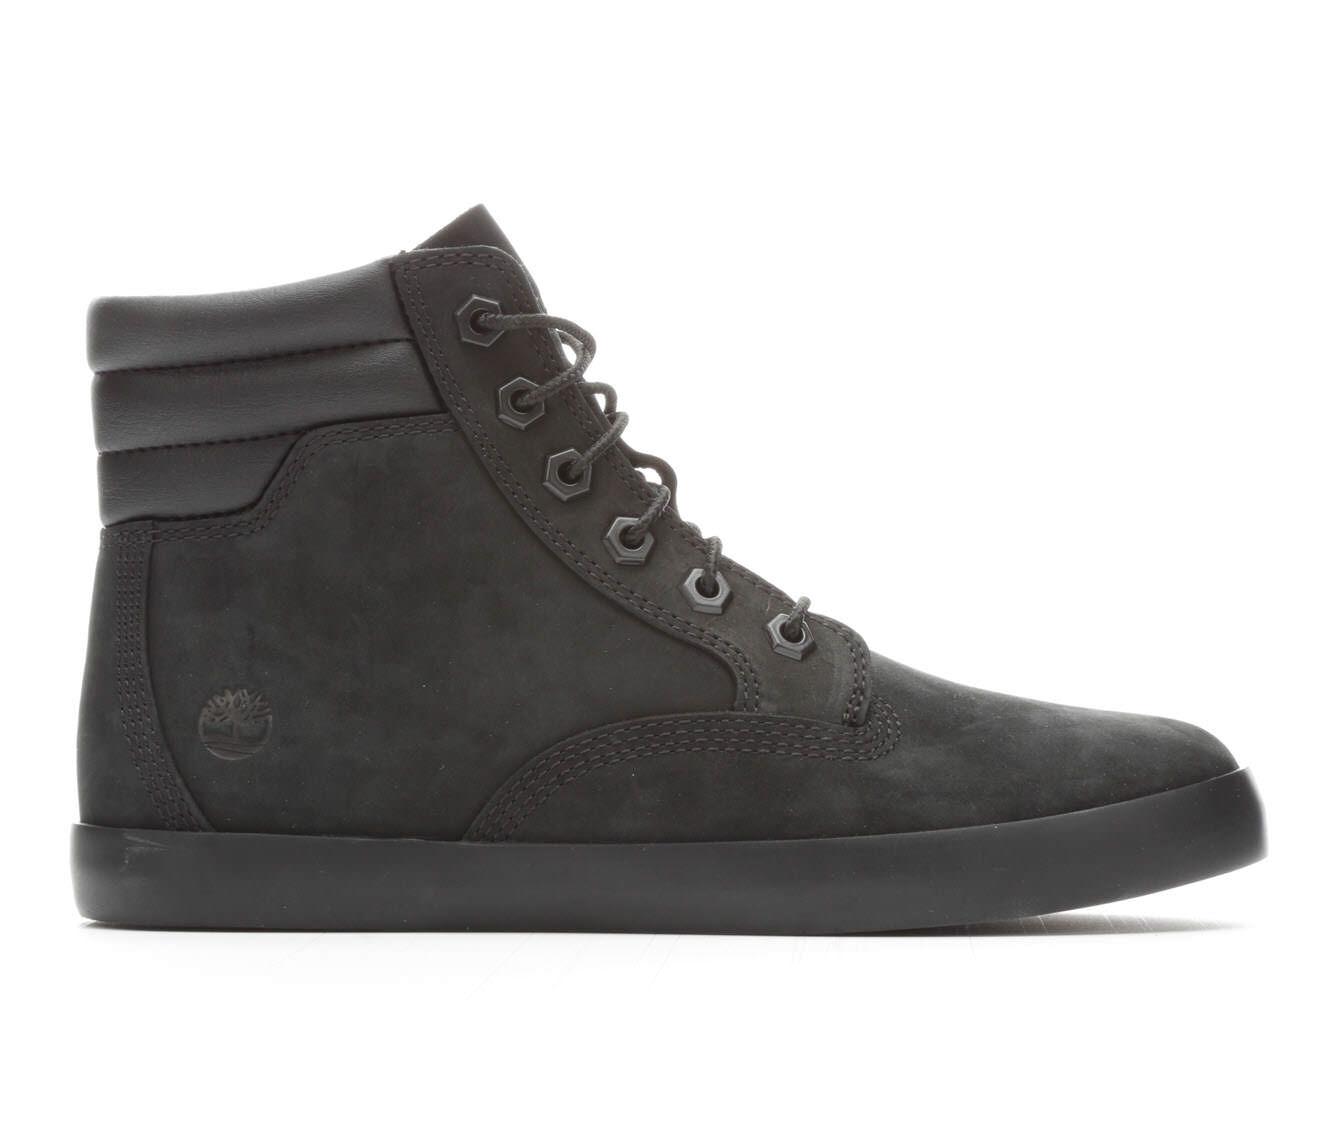 Women's Timberland Dausette Sneaker Boots Black